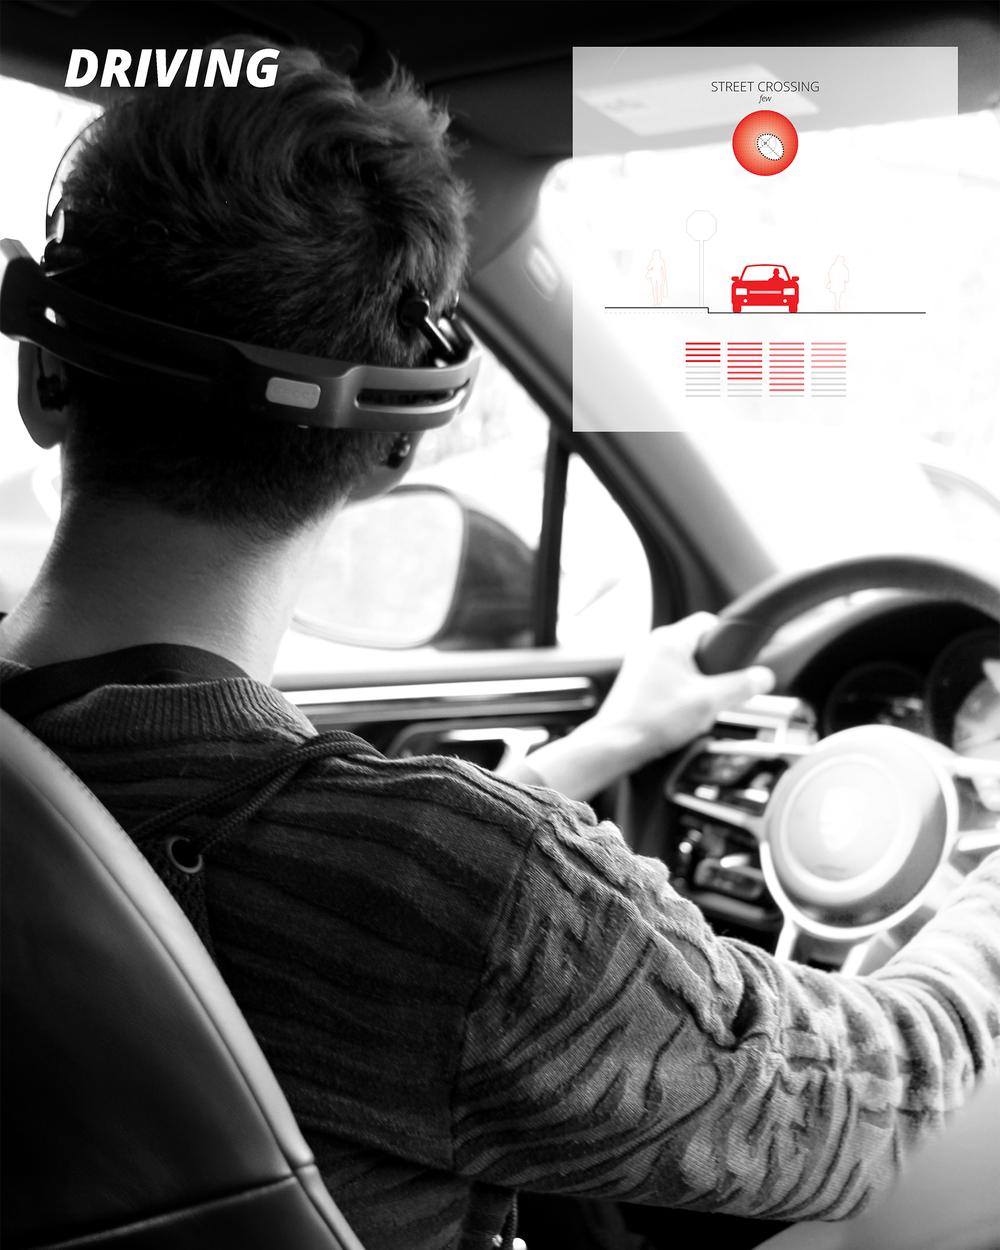 msc-driving.jpg